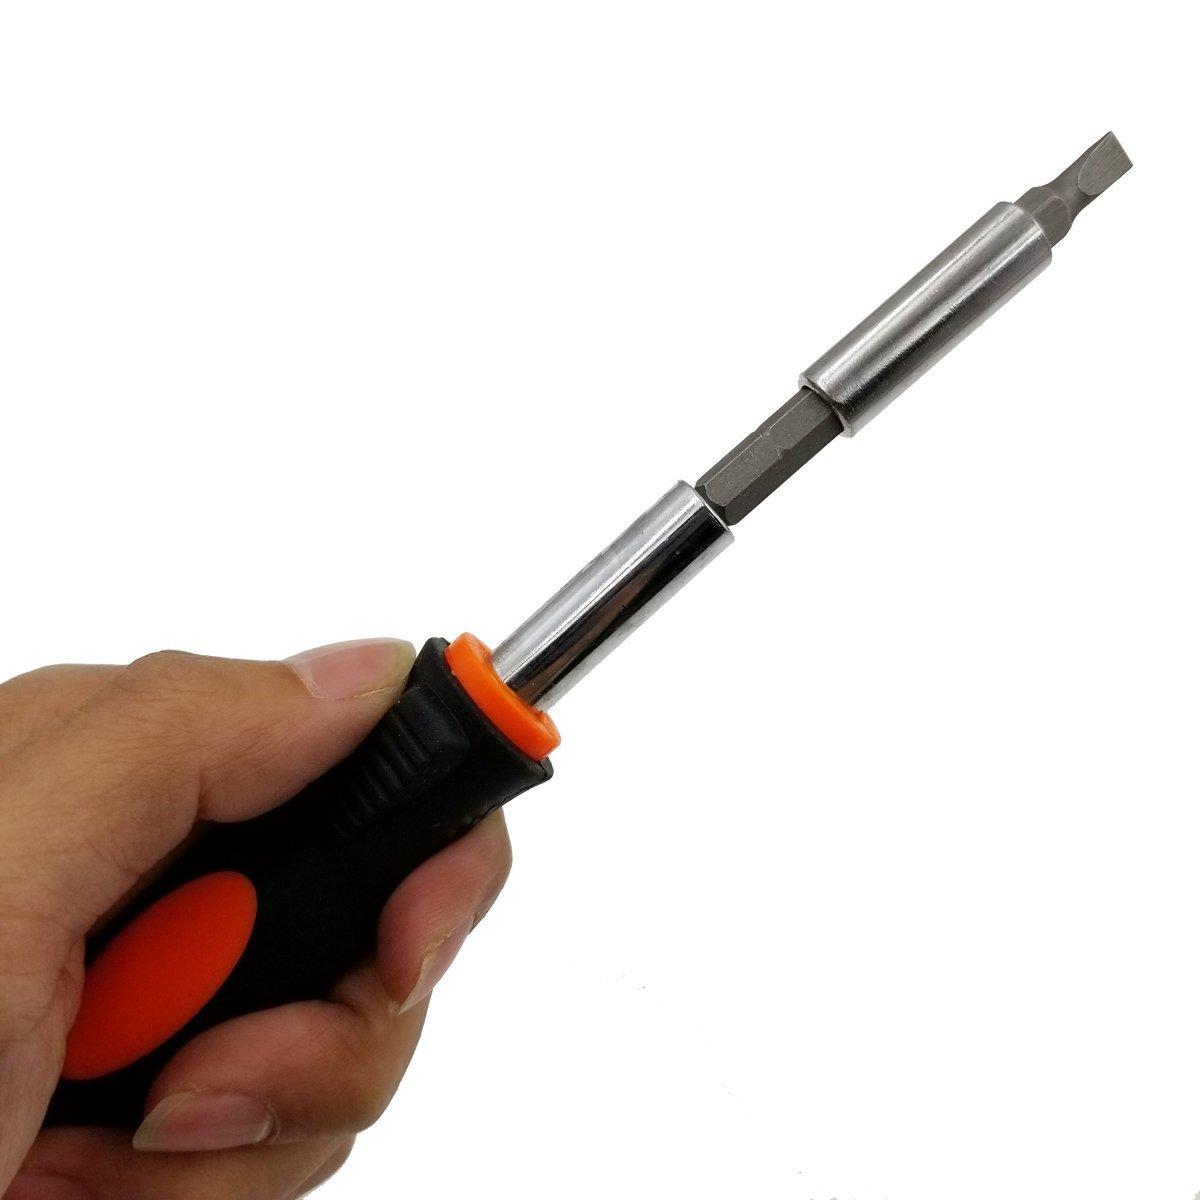 Brocas para destornillador flexible + destornillador magnético desmagnetizador + mango de destornillador magnético + cabezal de destornillador